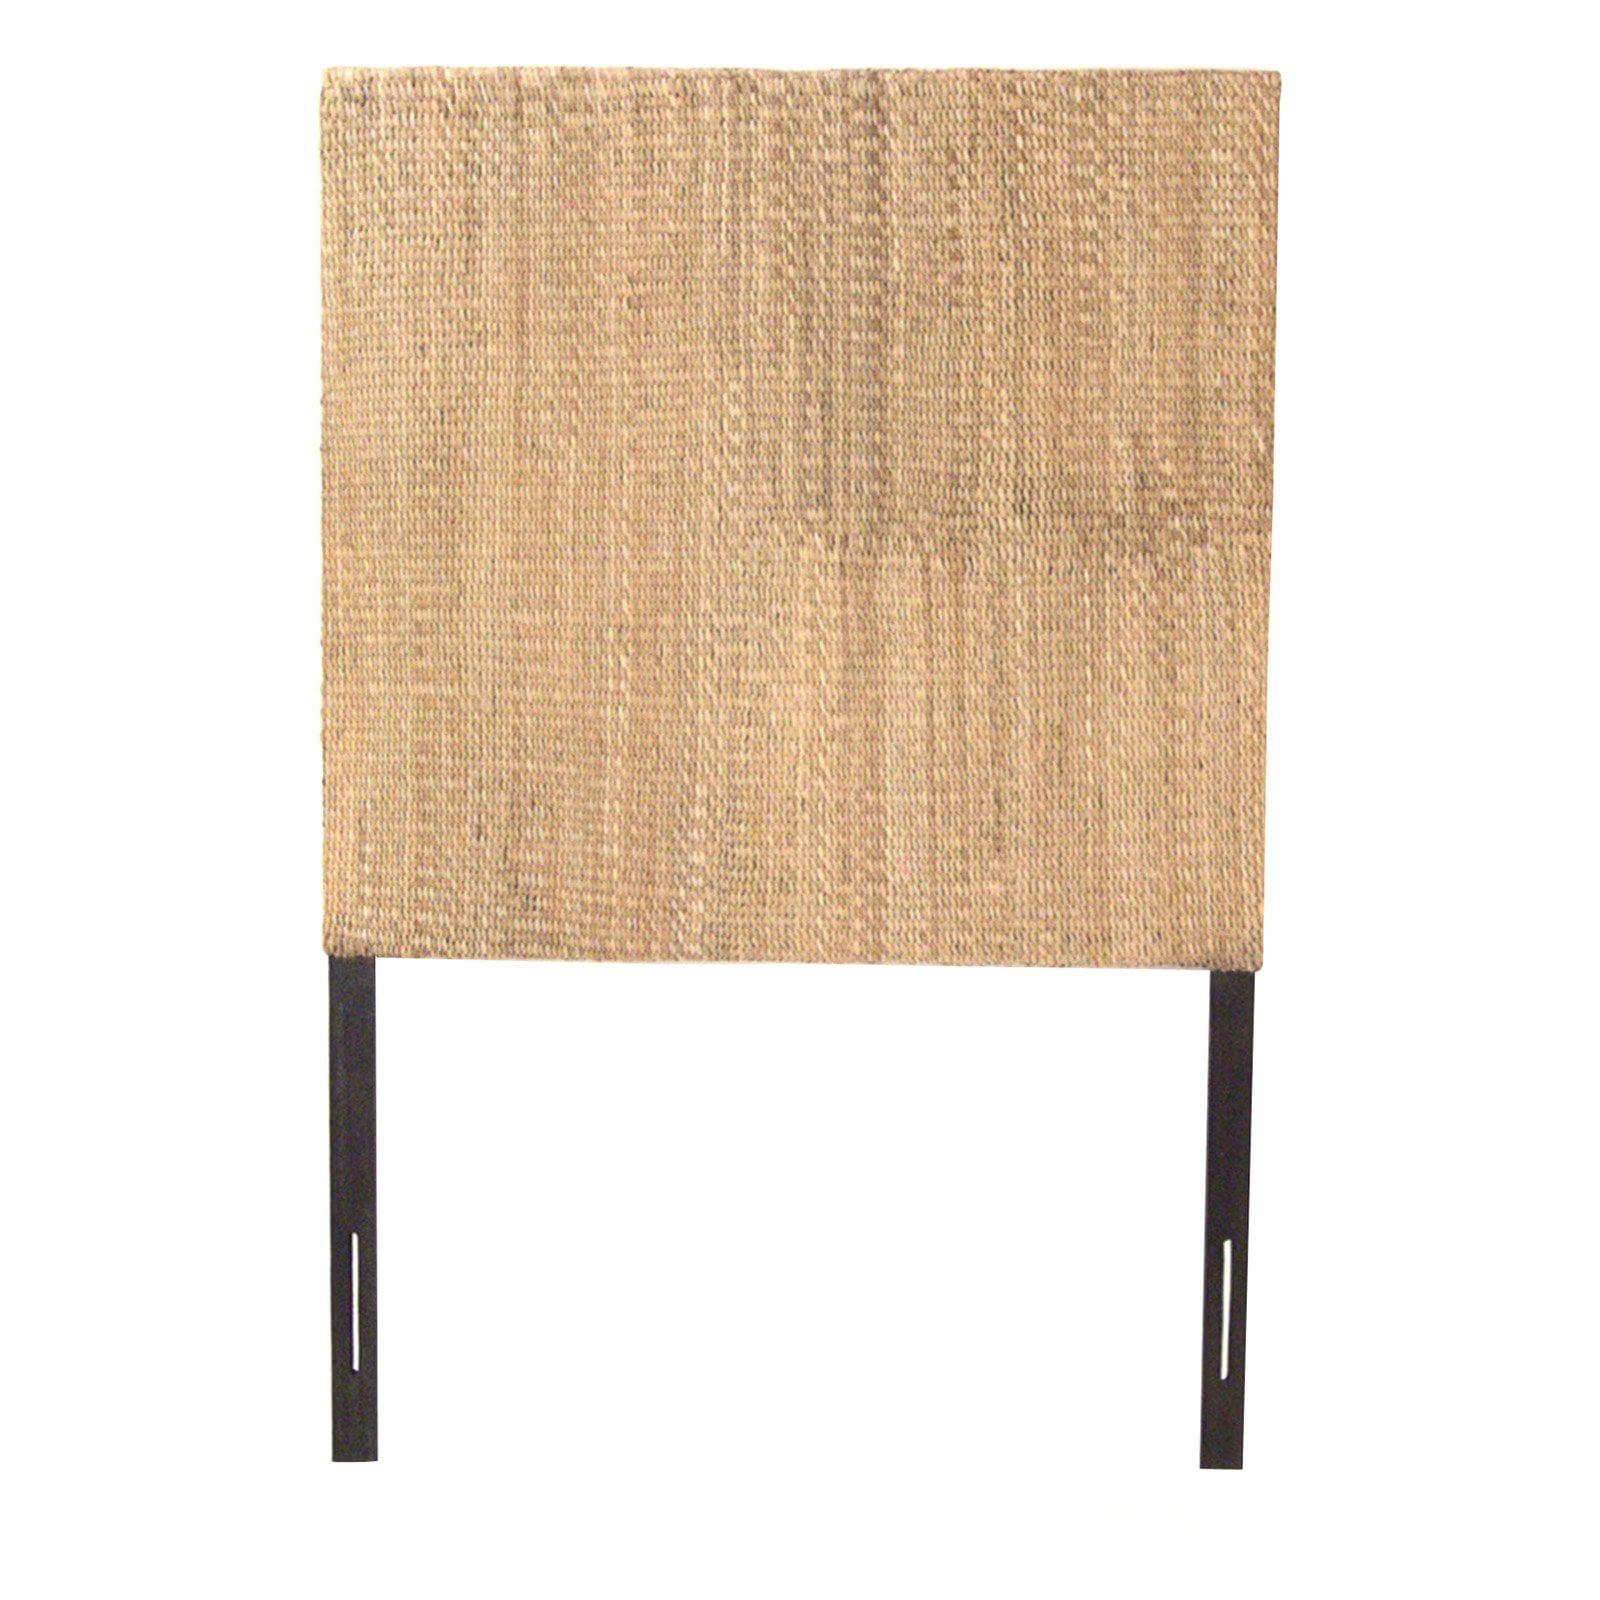 Padmas Plantation Grass Weave Headboard